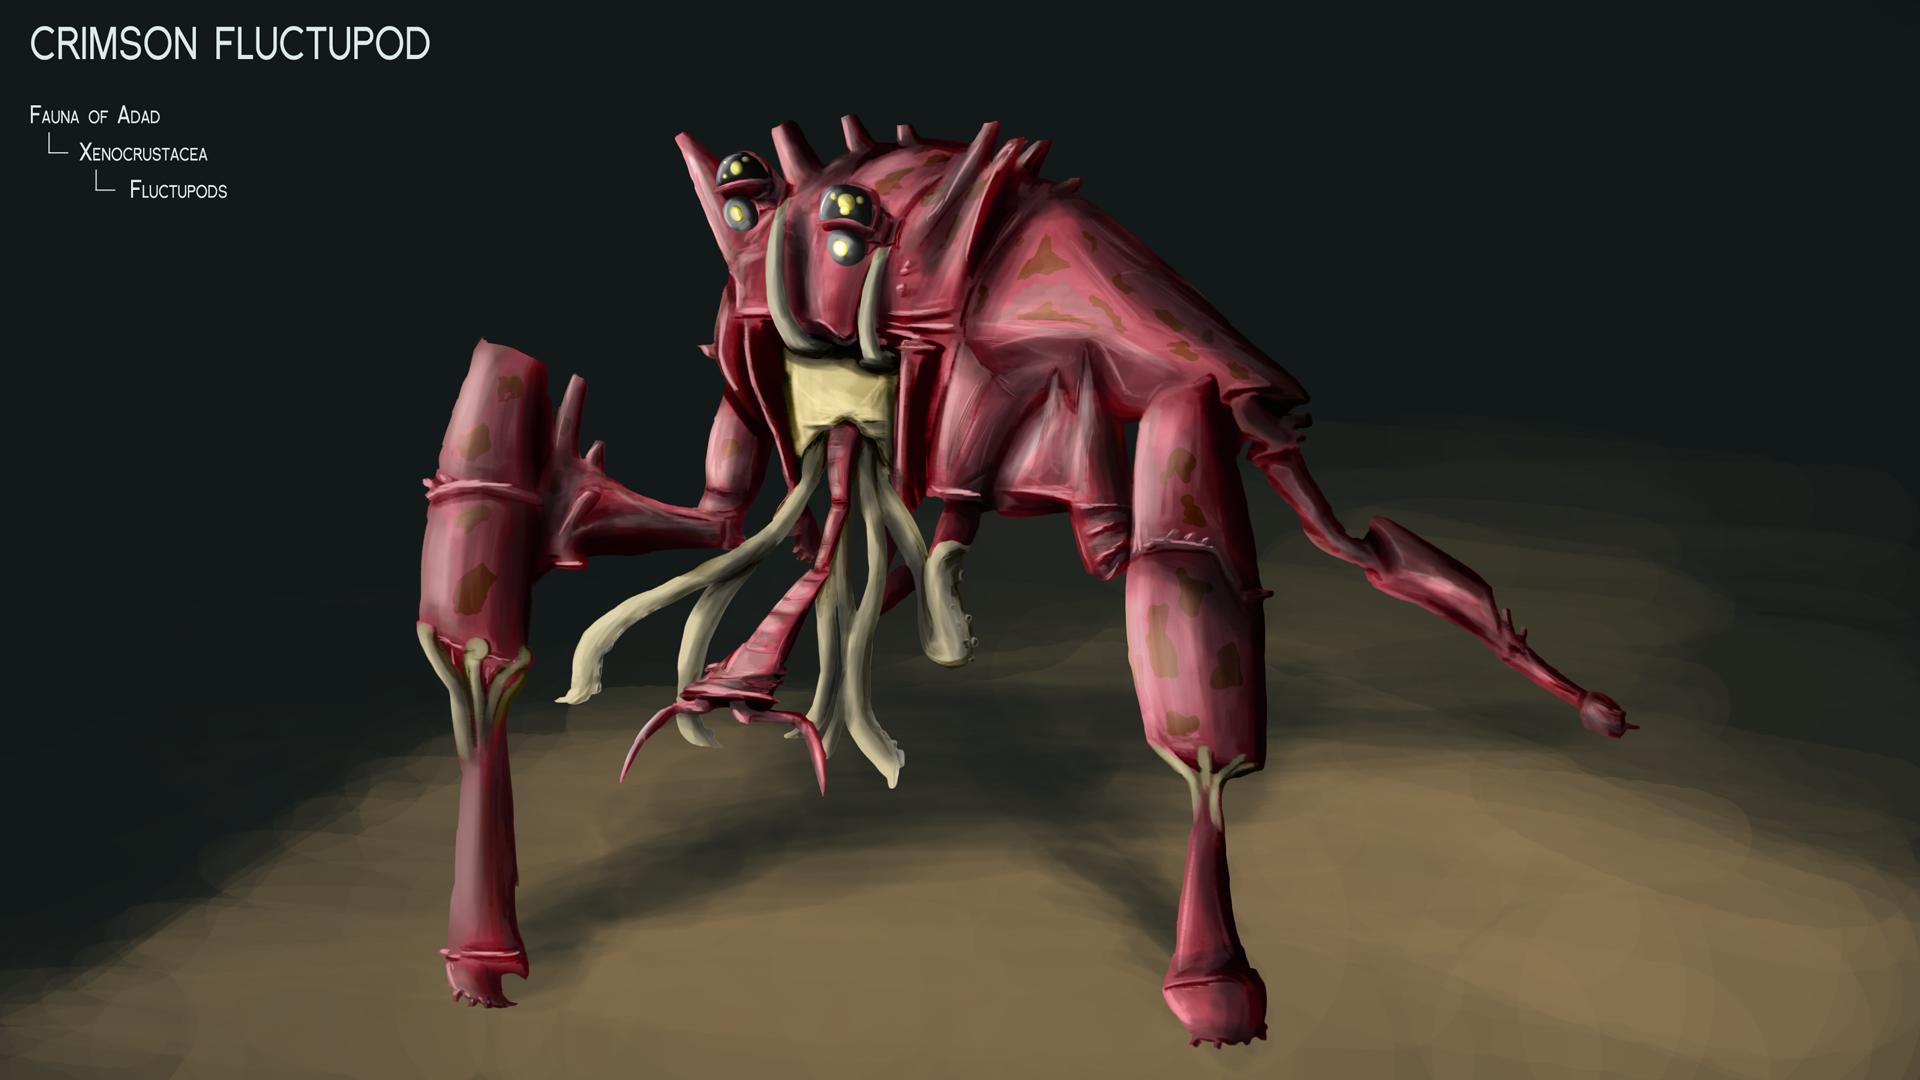 Crimson Fluctupod by Dingbat1991